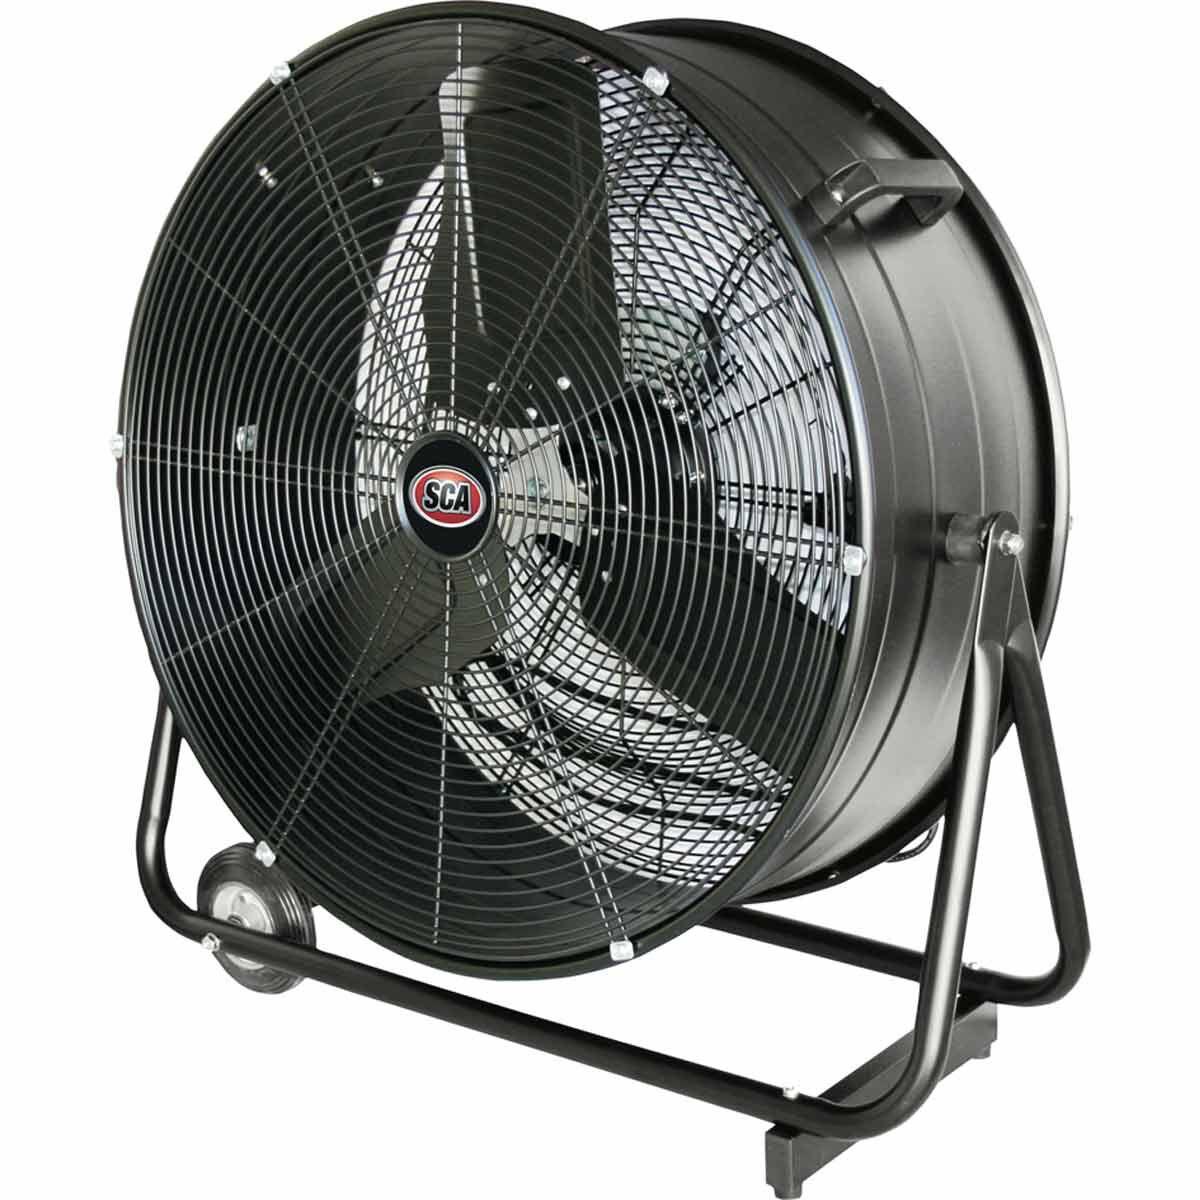 Sca Garage Drum Fan 600mm Supercheap Auto